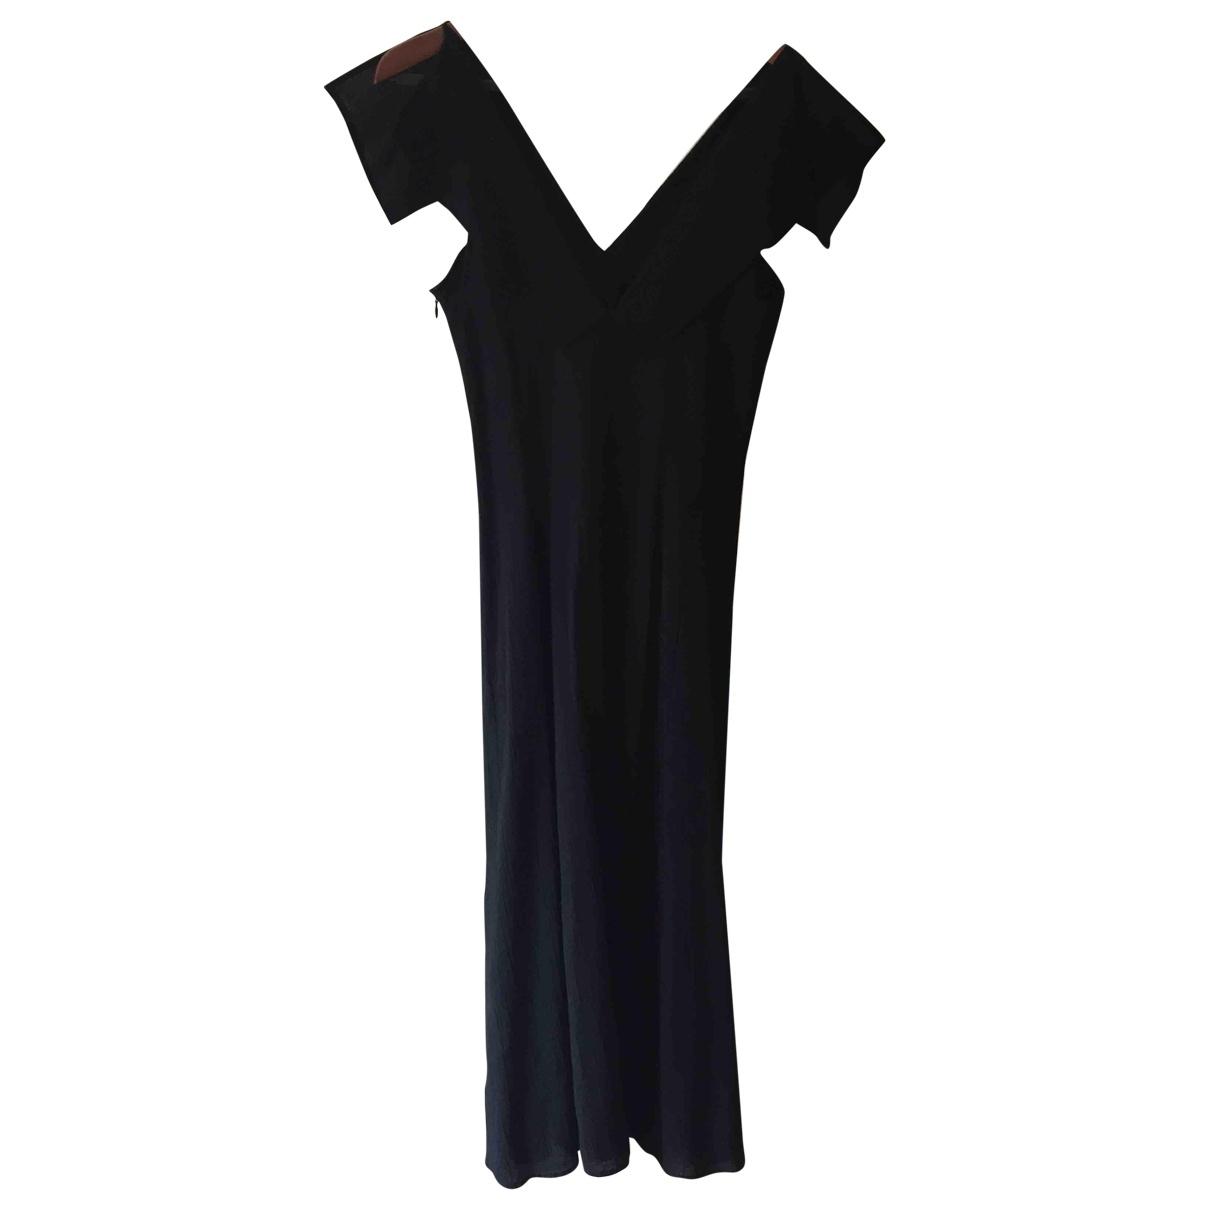 Yohji Yamamoto \N Black Cotton dress for Women 10 UK